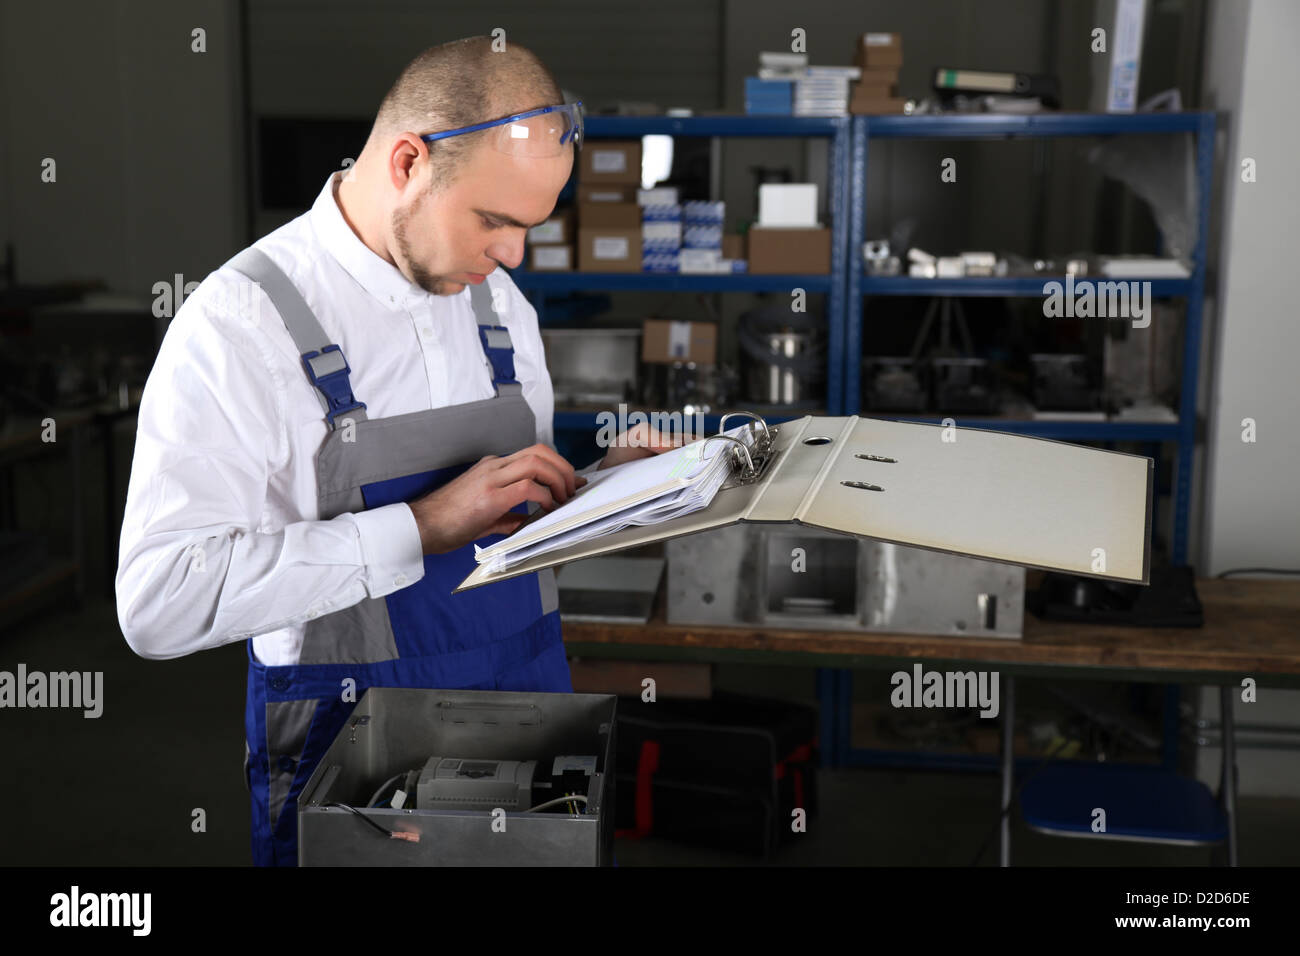 Mechanische Techniker bei der Arbeit Stockbild